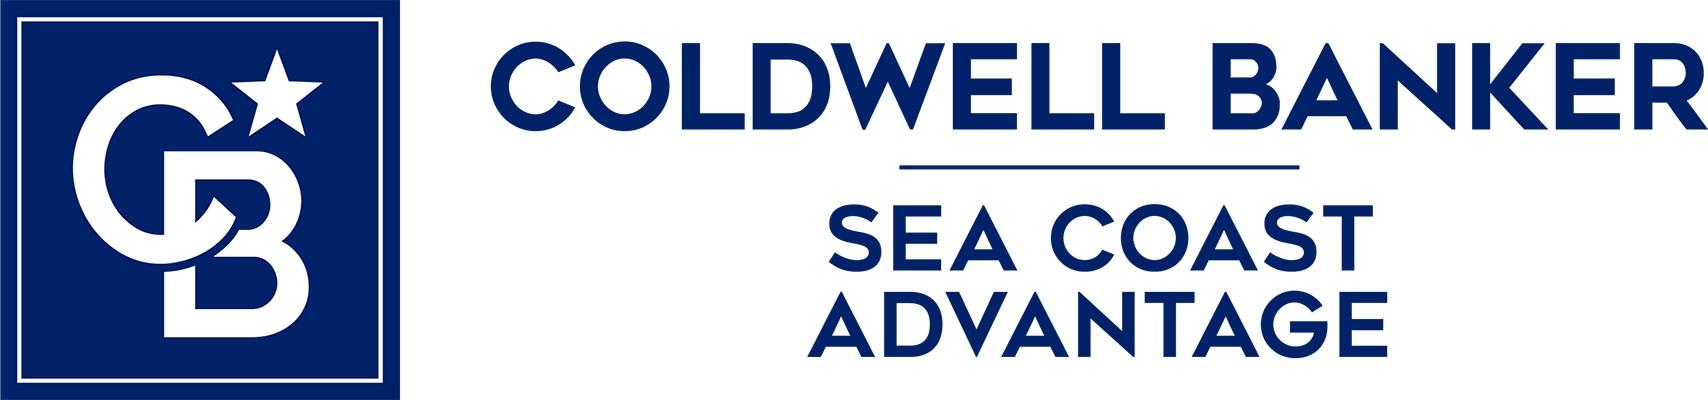 Suzanne Hoskins - Coldwell Banker Sea Coast Advantage Realty Logo